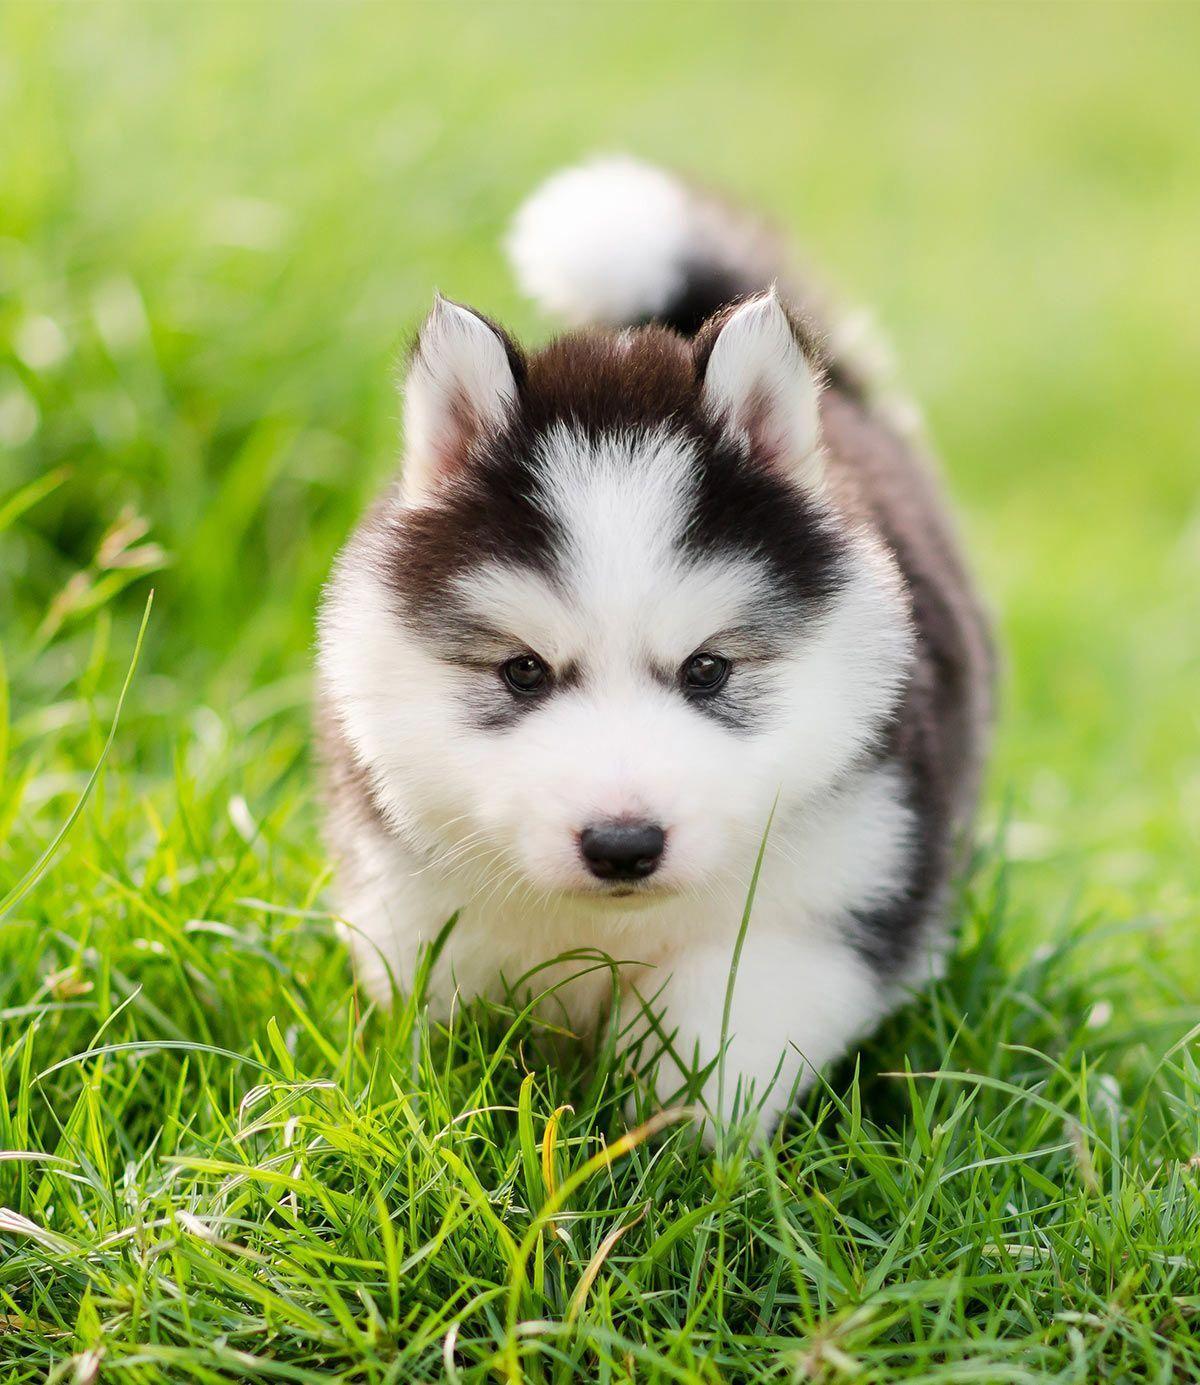 Find Out More On Athletic Siberian Husky  Temperament #siberianhuskygram #siberianhuskeybordermix #siberianhuskyblack